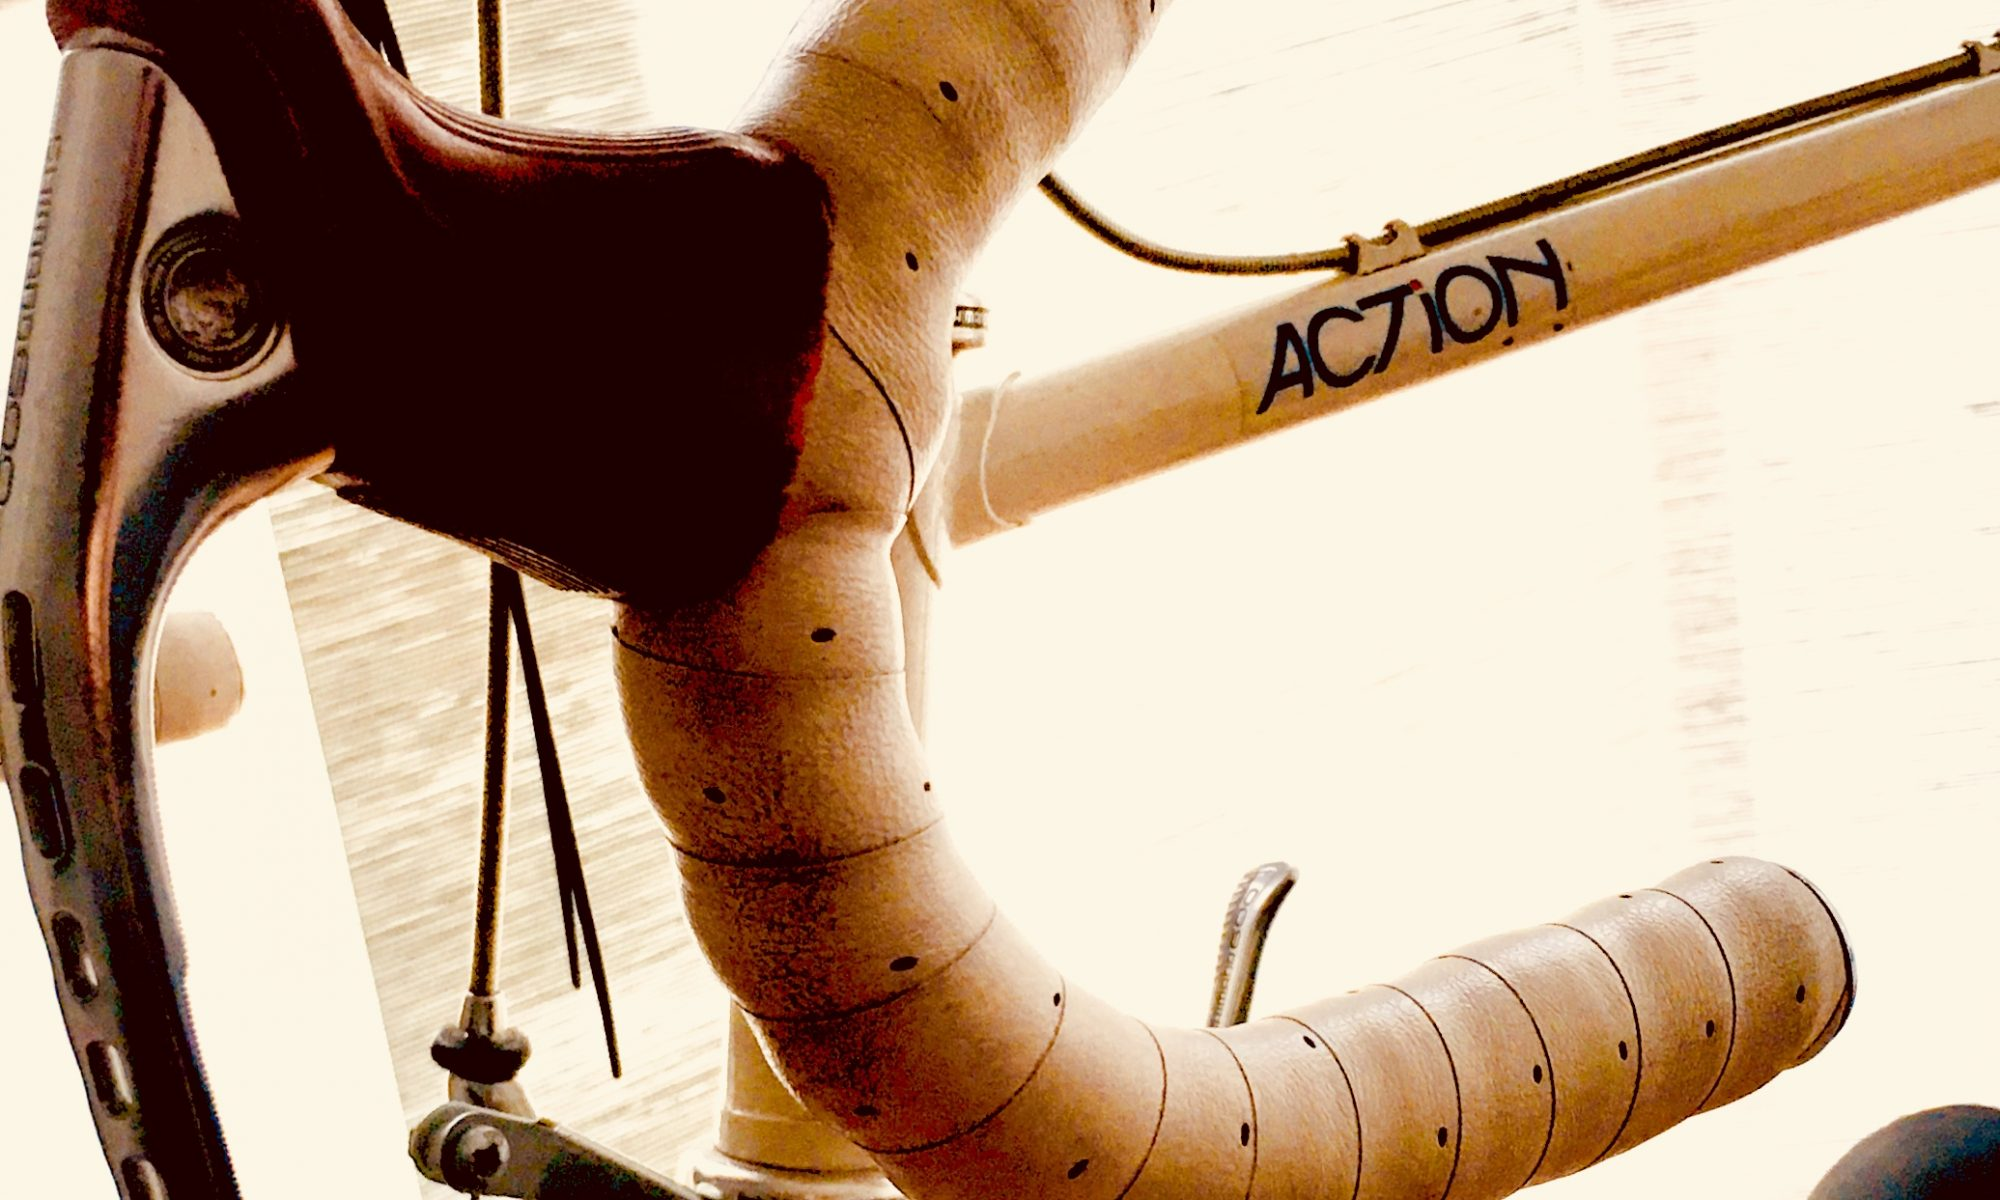 Canguro Bikes